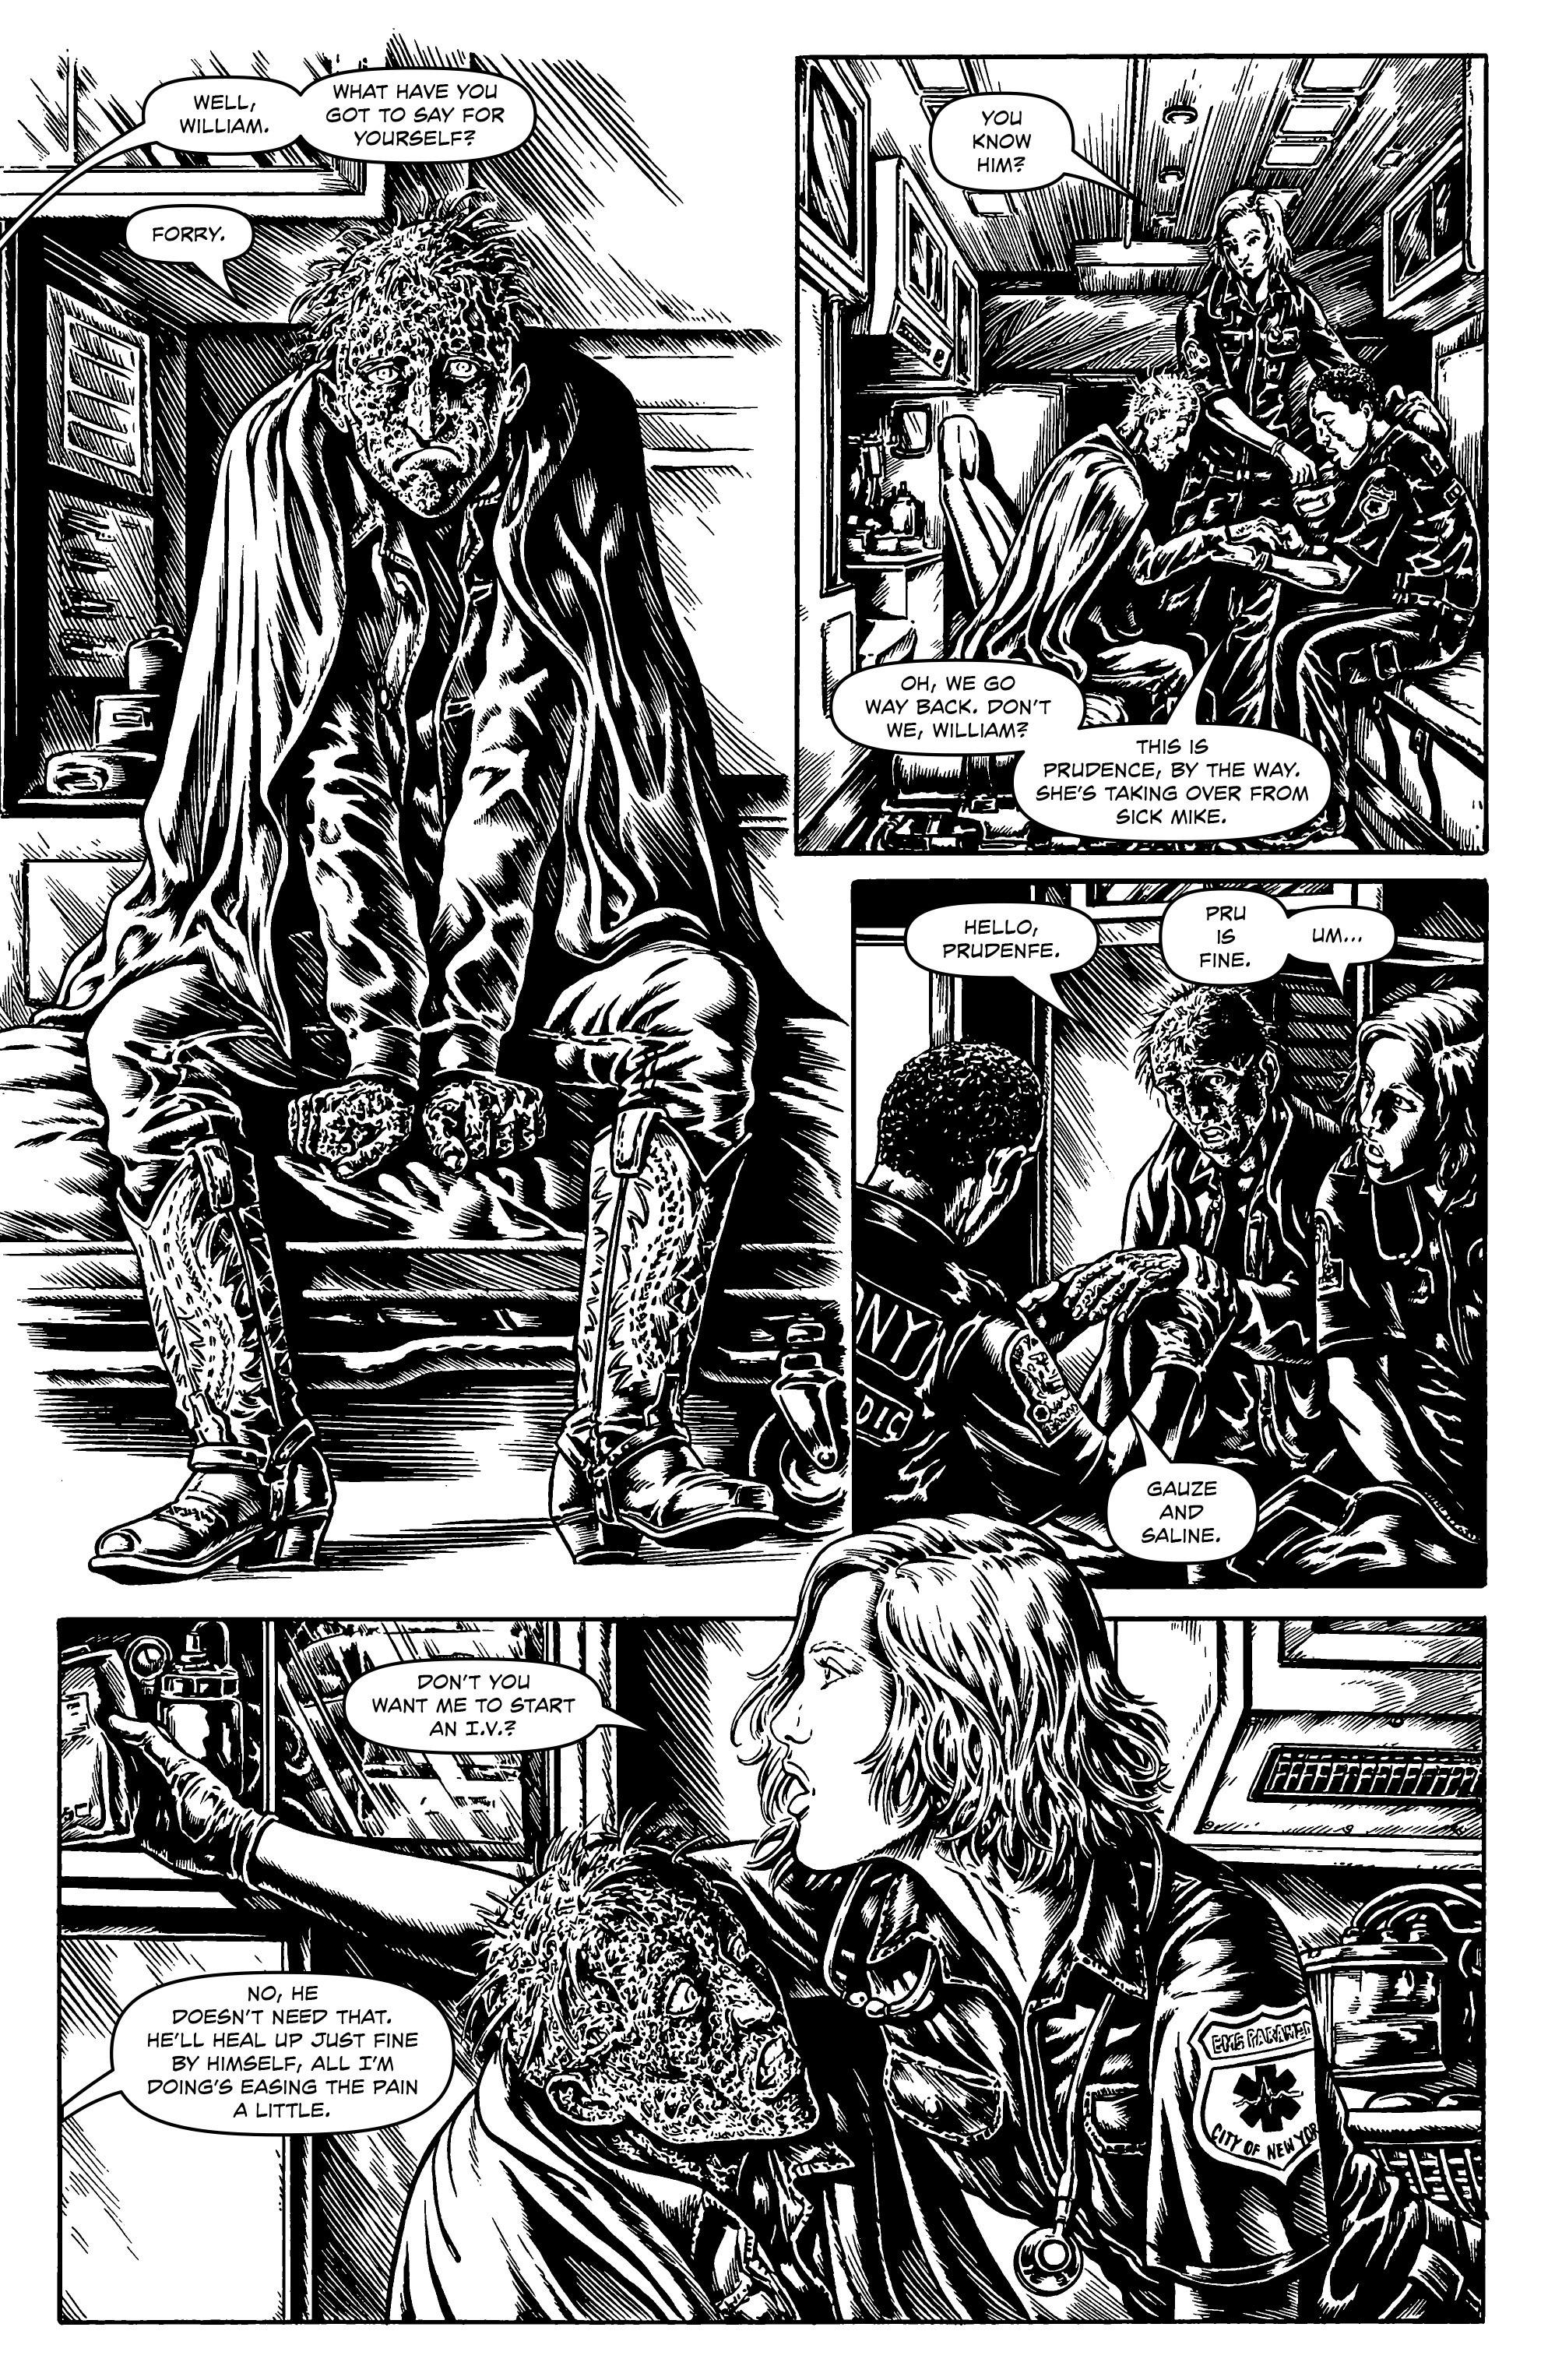 Read online Alan Moore's Cinema Purgatorio comic -  Issue #1 - 17